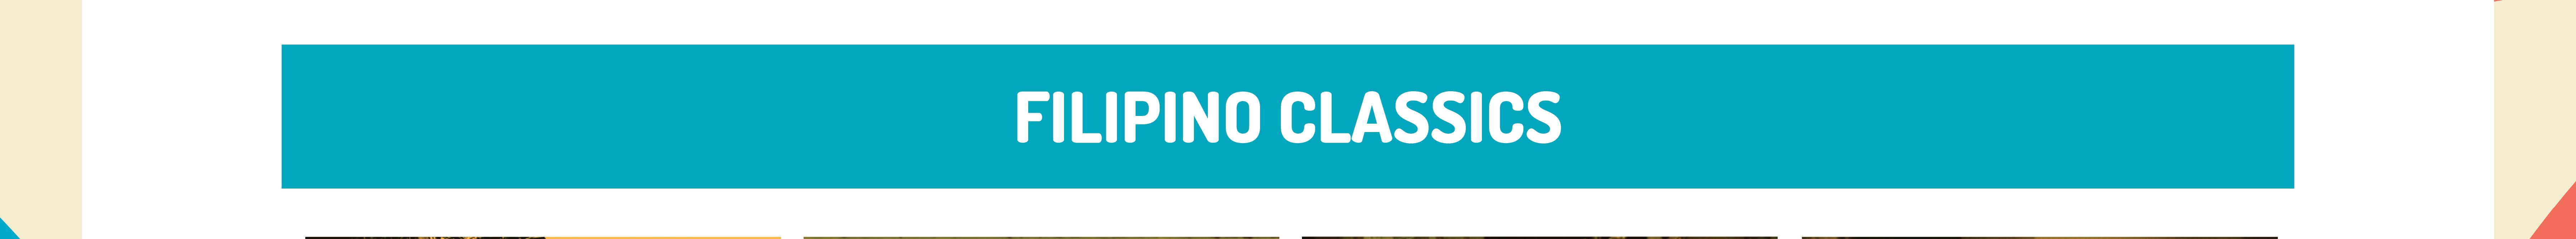 Banner Filipino Classics